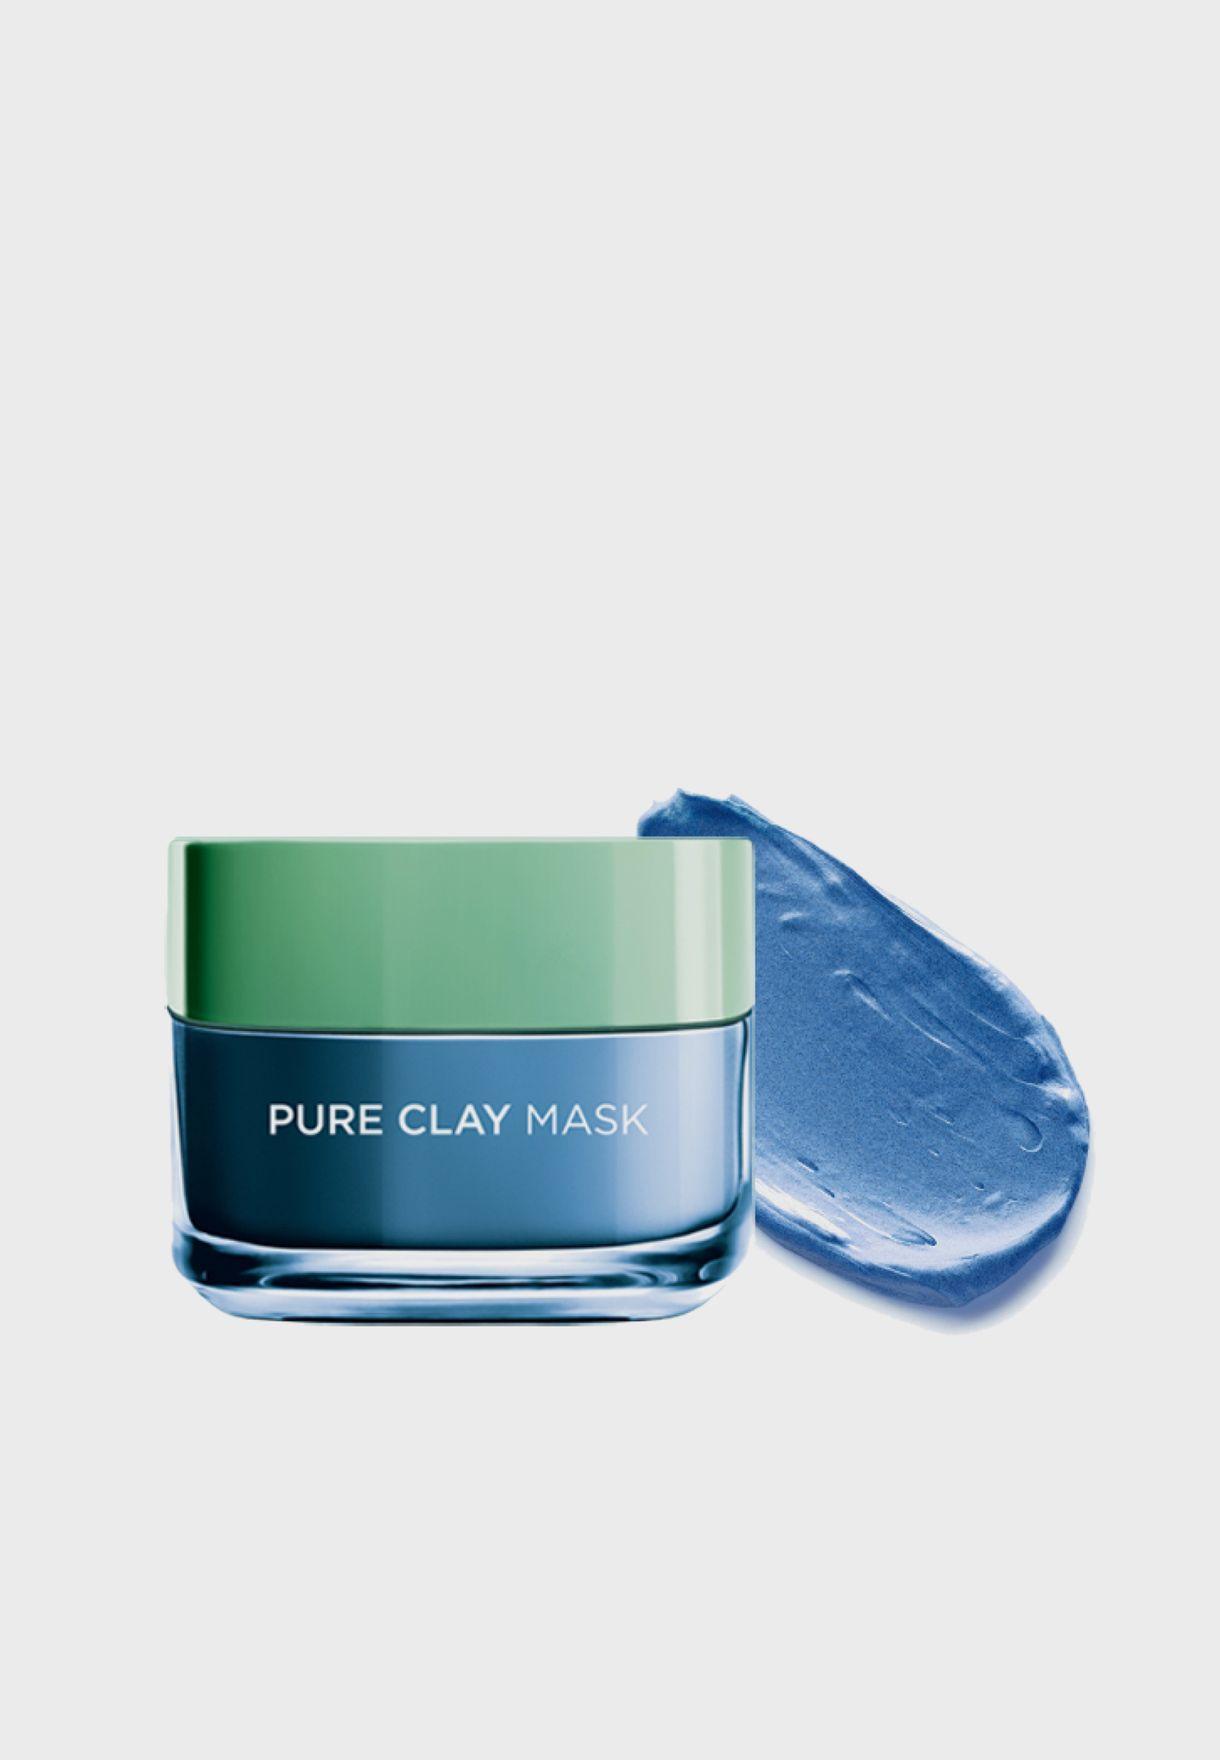 Skin Care Routine Saving, 33%